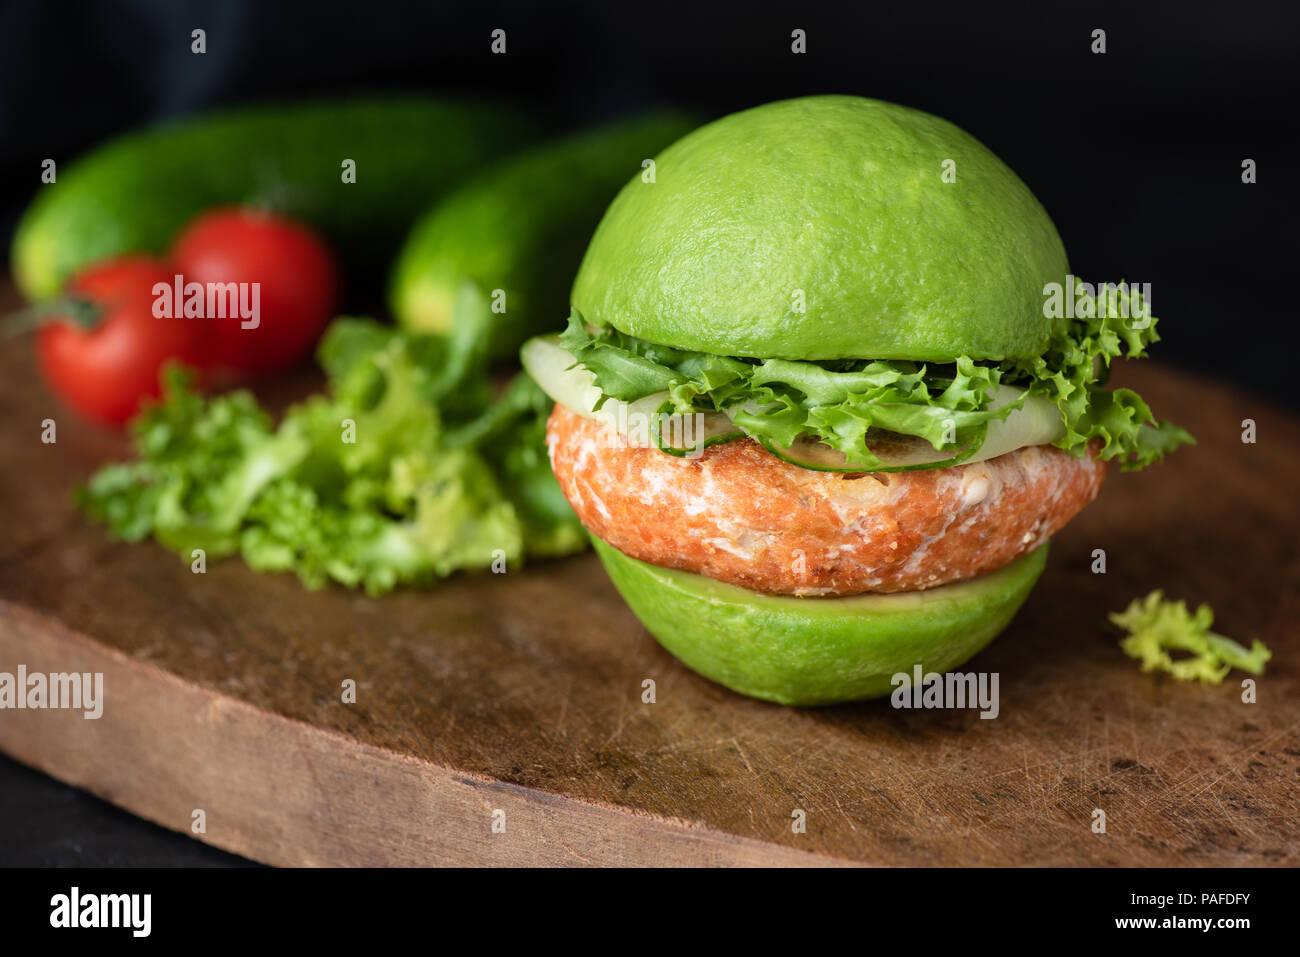 Vegan avocado Burger mit Karotte Linse pattie auf Holz. Detailansicht, selektiver Fokus Stockbild